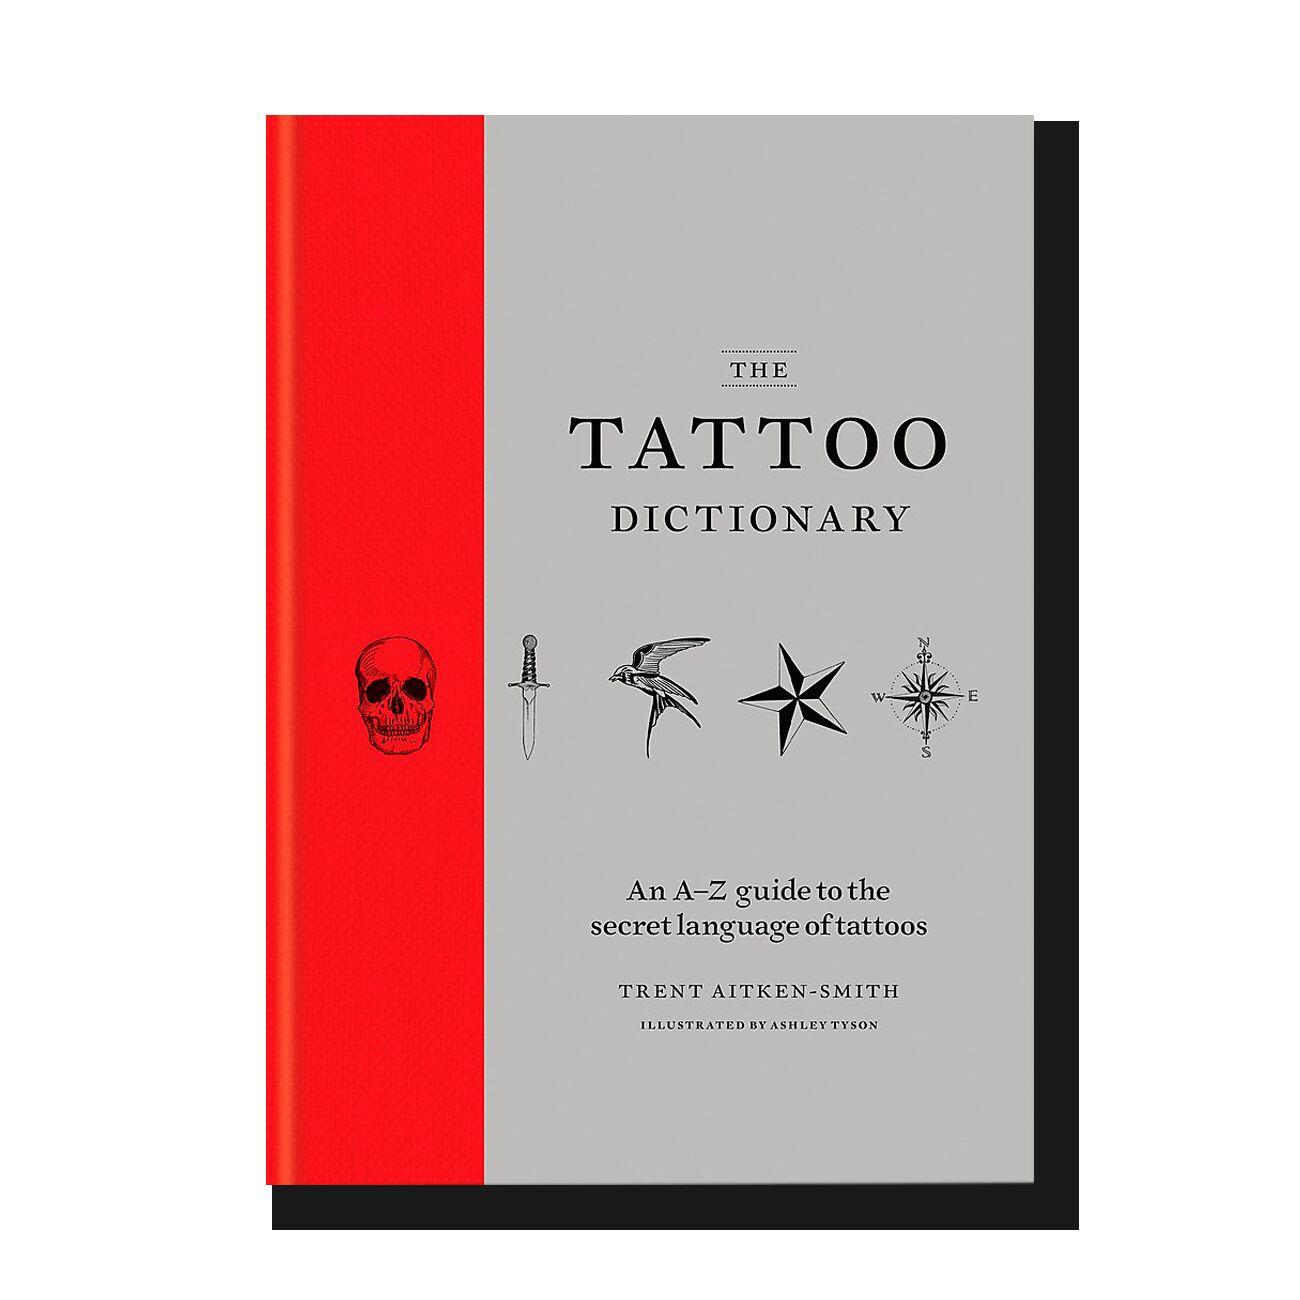 The Tattoo Dictionary